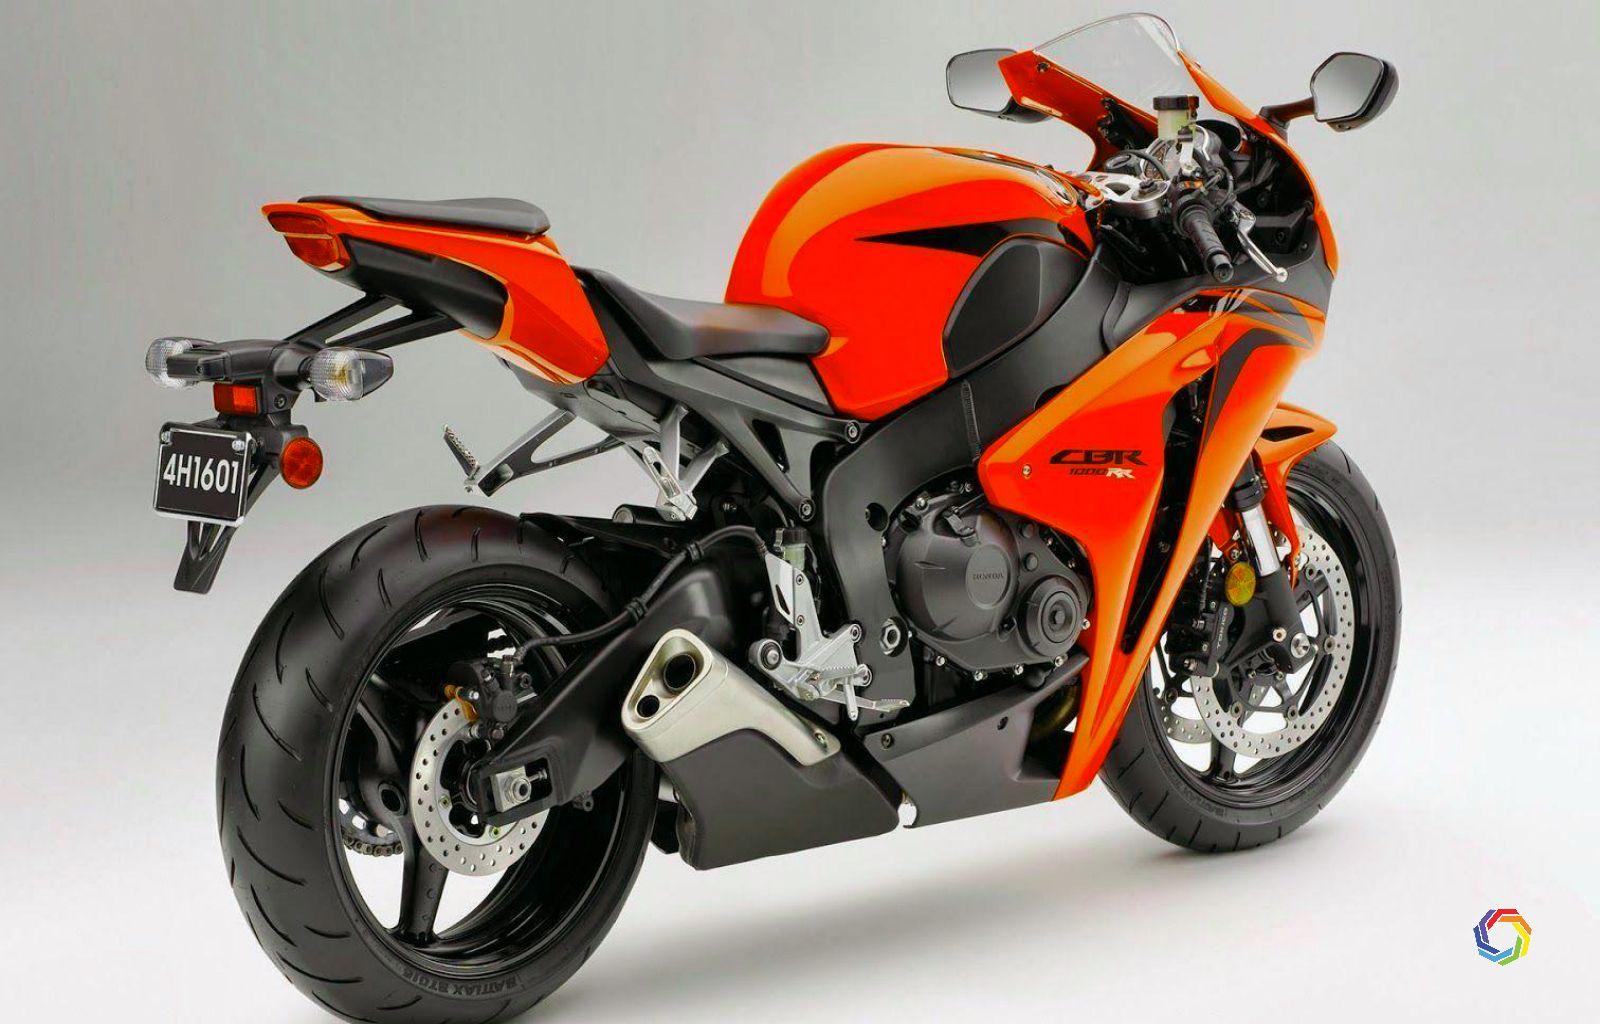 Download Latest Heavy Bike Wallpapers HD Desktop Widescreen Wallpaper Or High Definition From